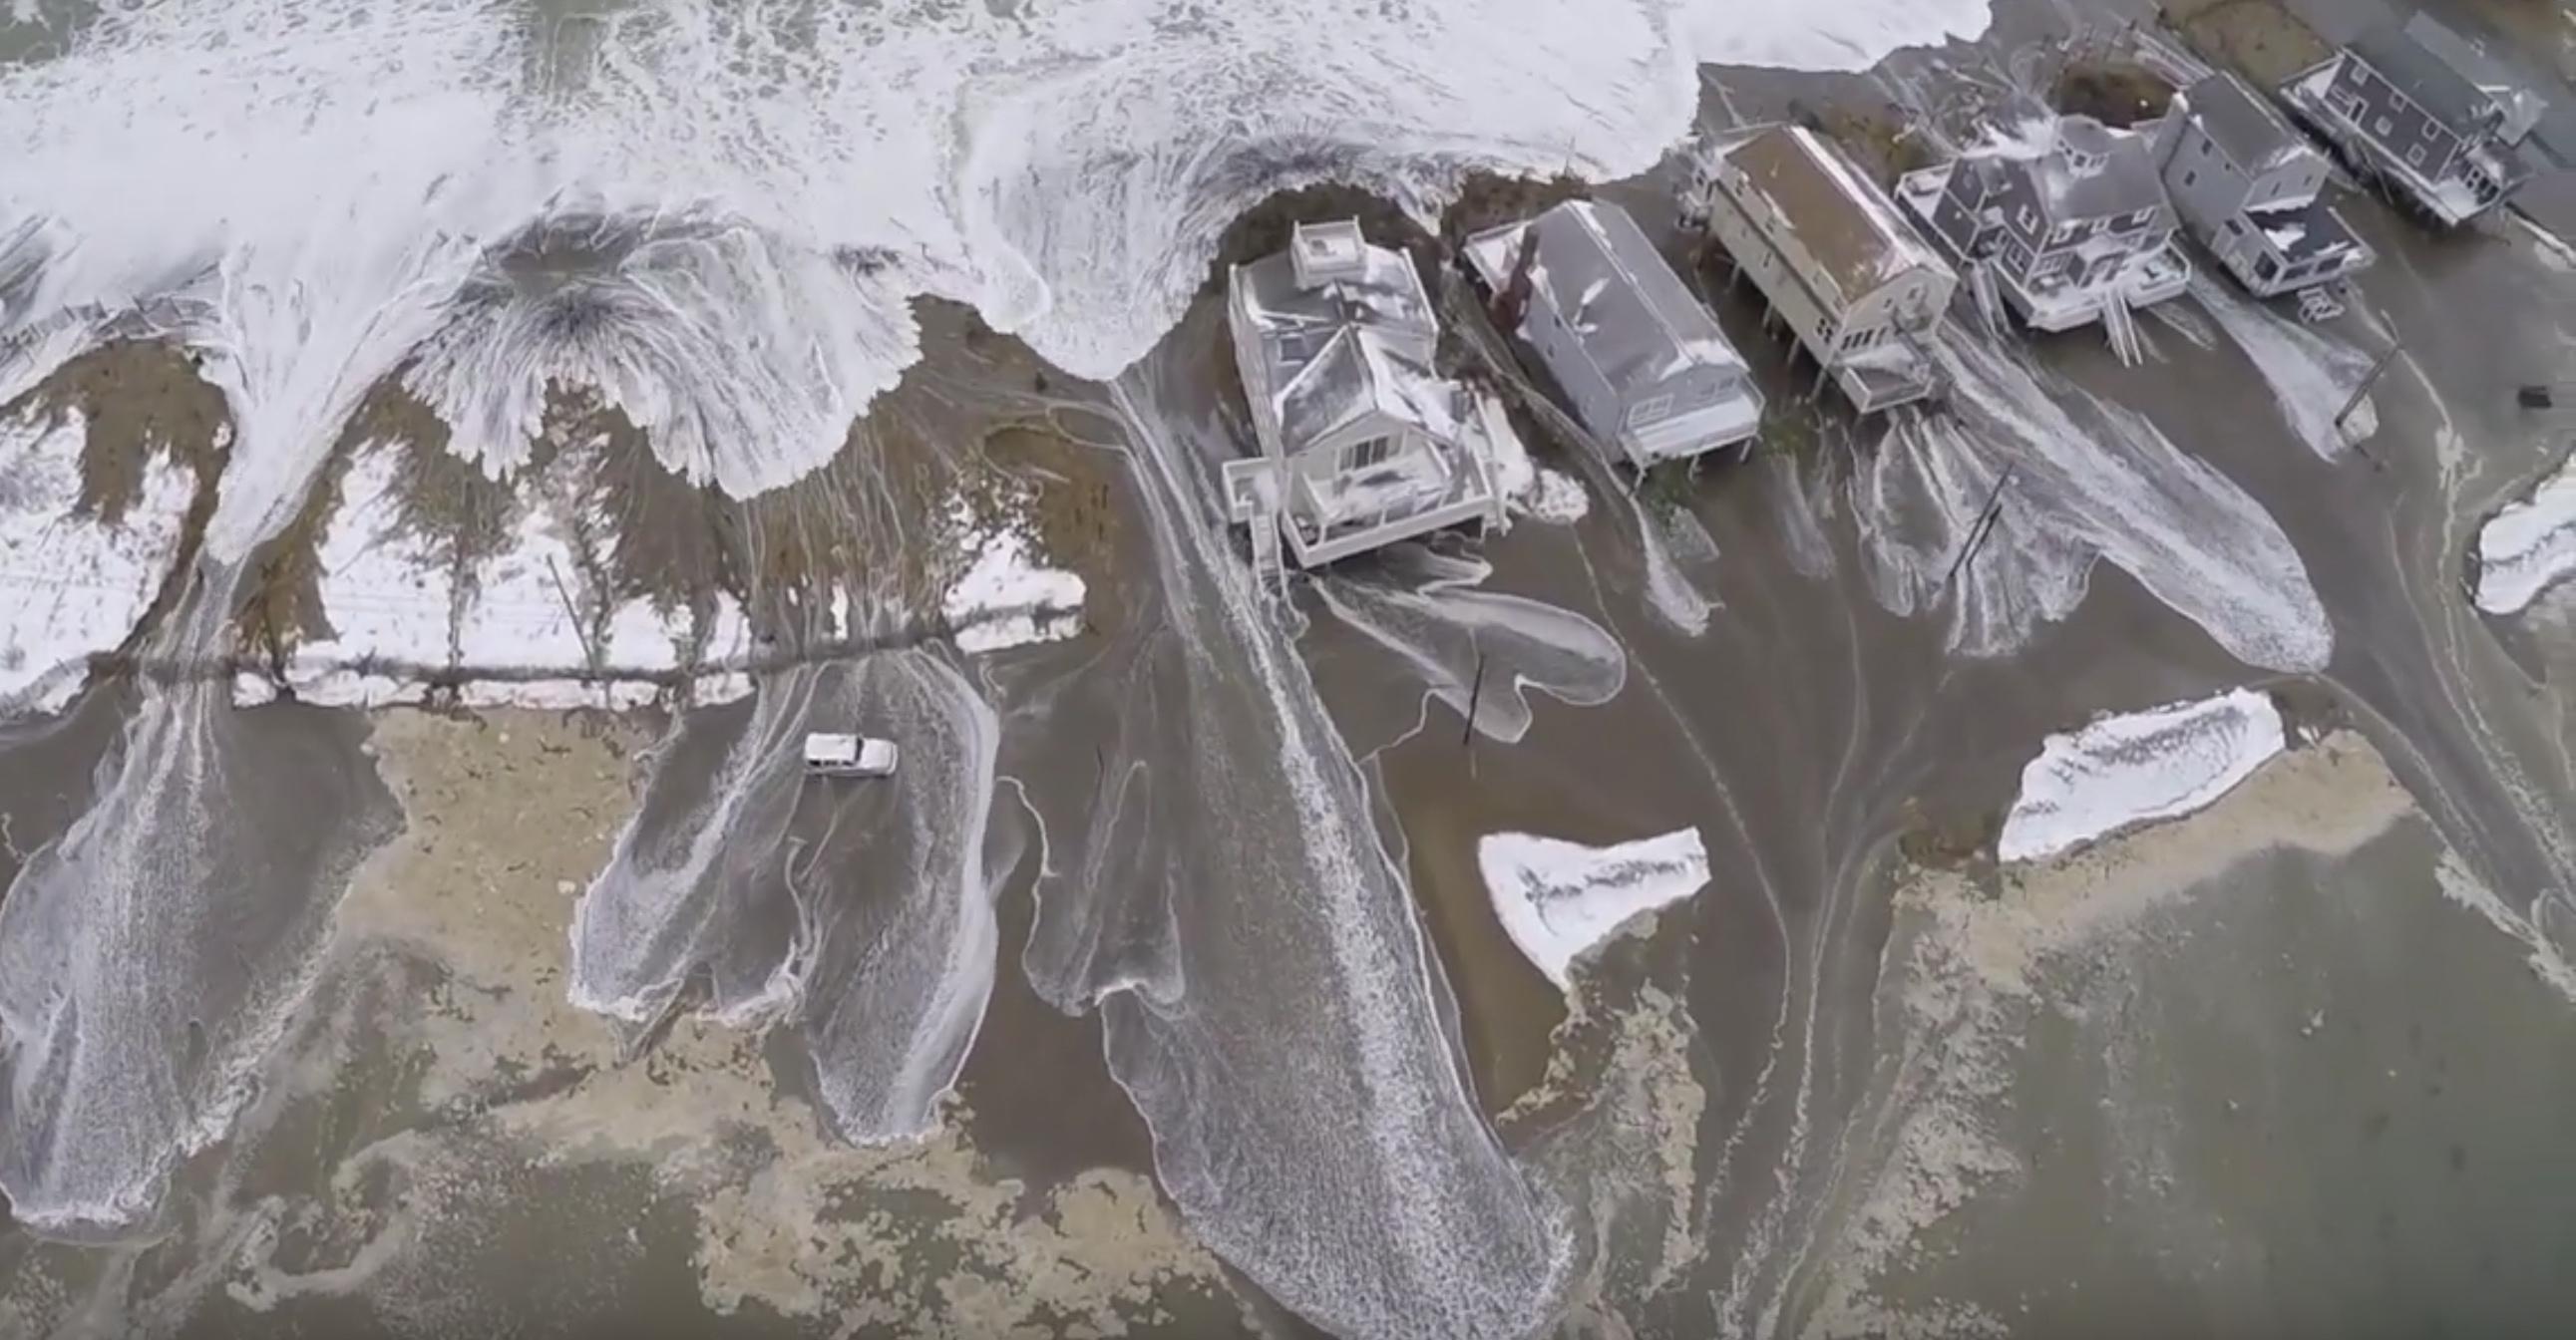 Flooding along the coast of Cape Cod